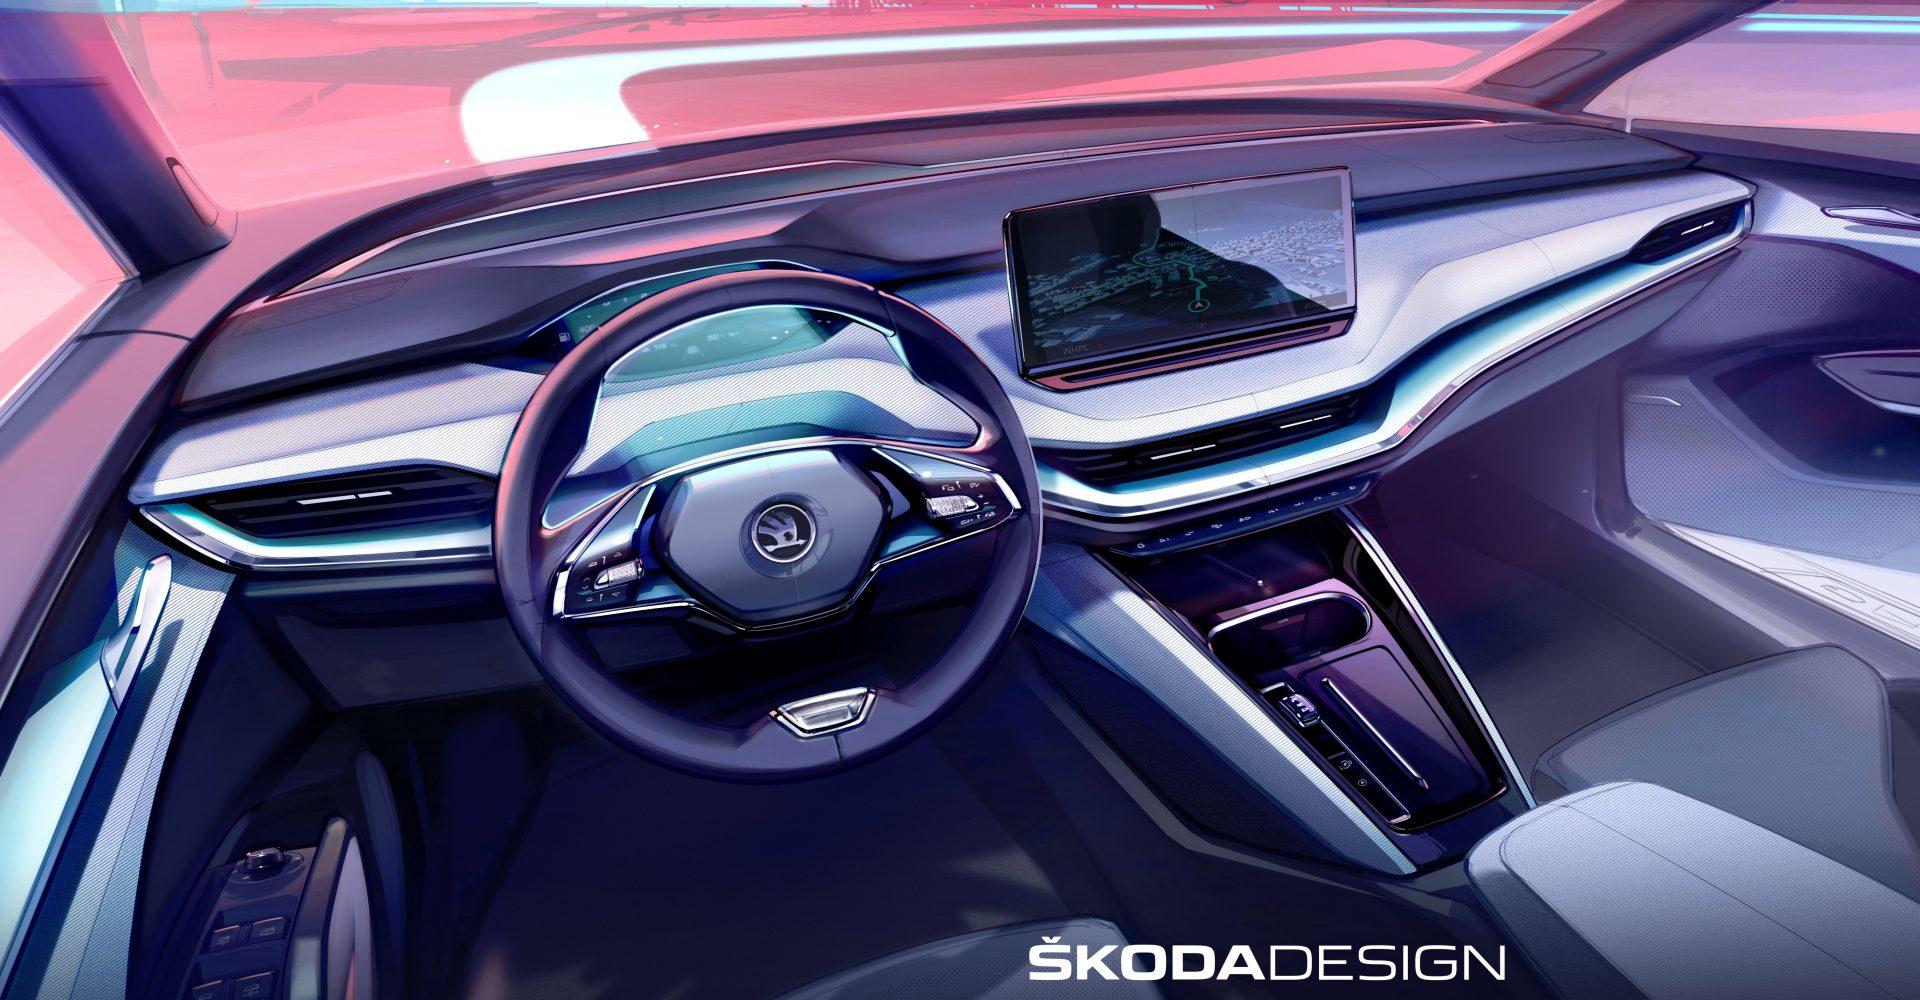 New Skoda Enyaq interior detailed in teaser image